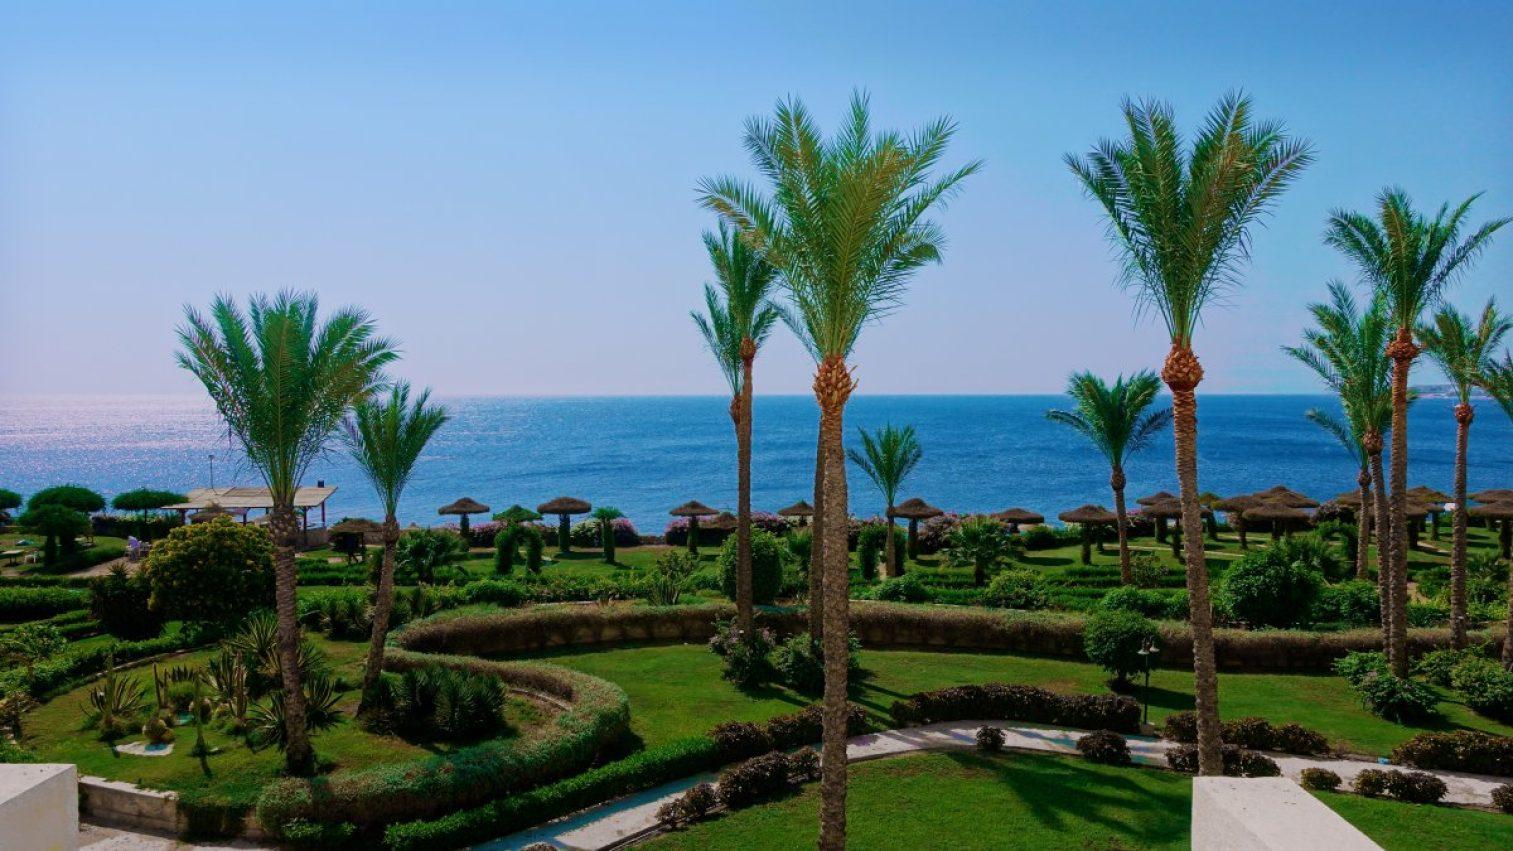 sea, egypt, palm trees